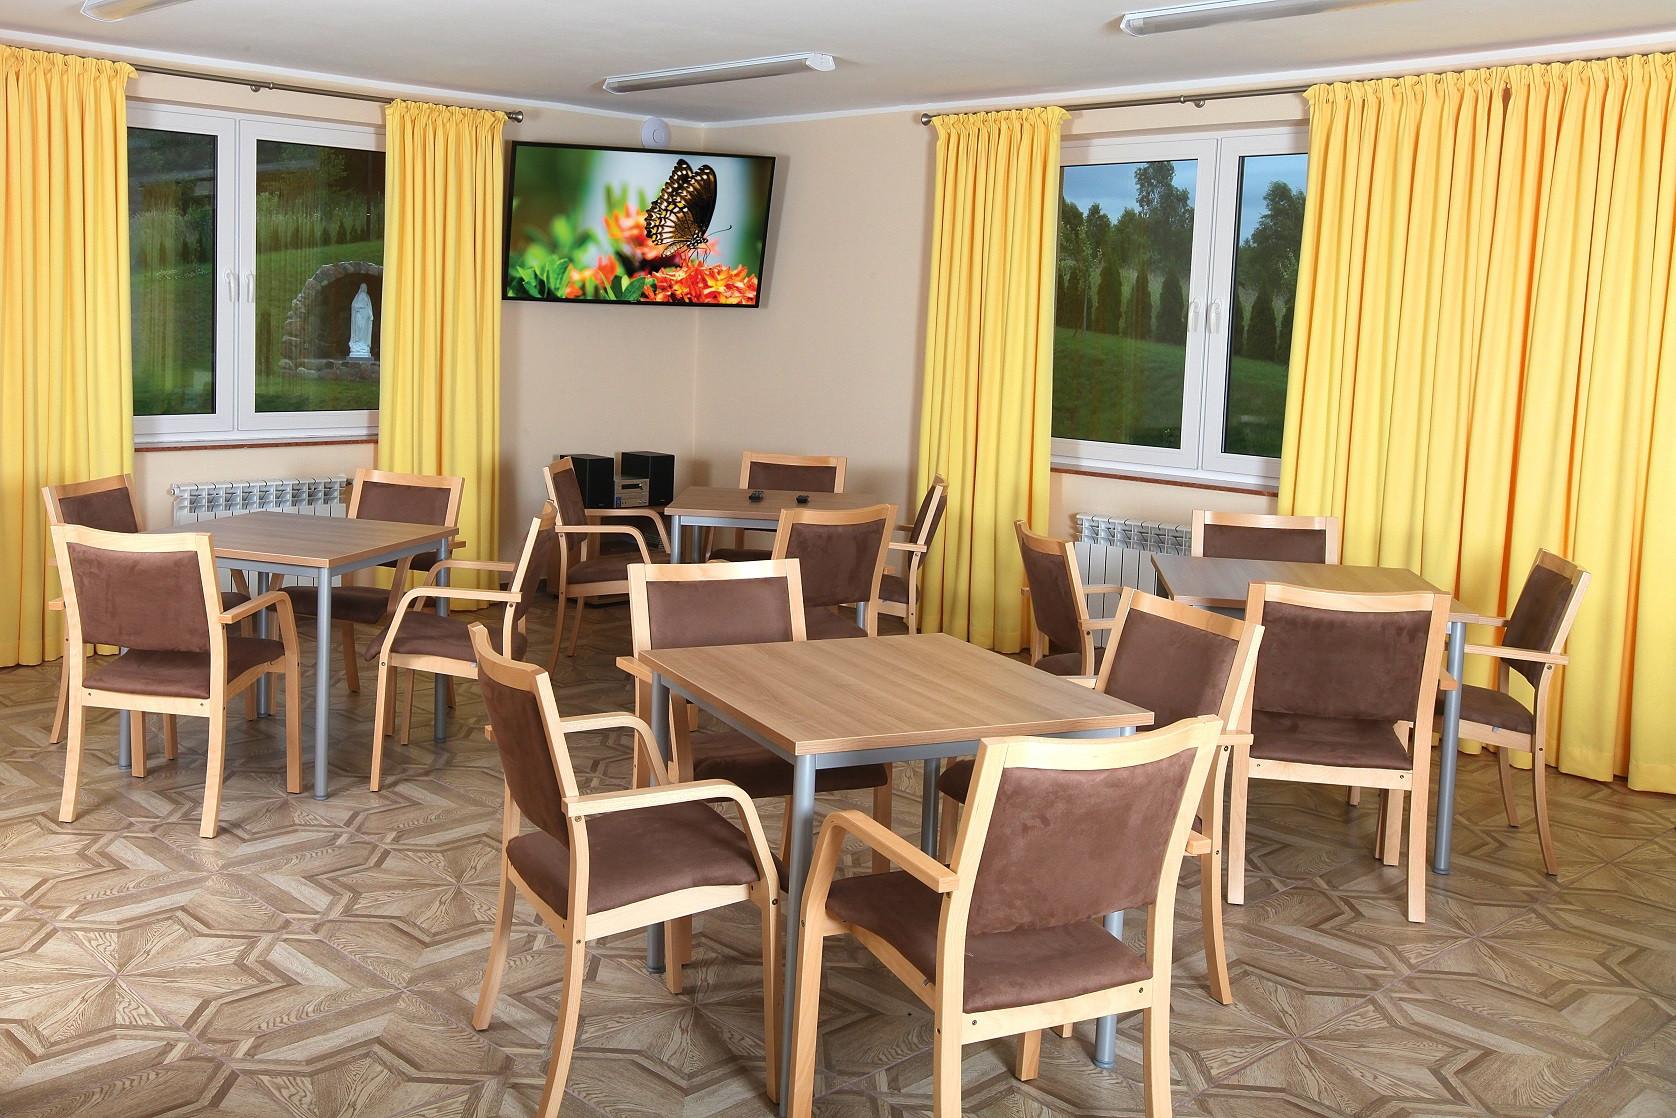 seniorenheim familia in szczecinek auf wohnen im. Black Bedroom Furniture Sets. Home Design Ideas